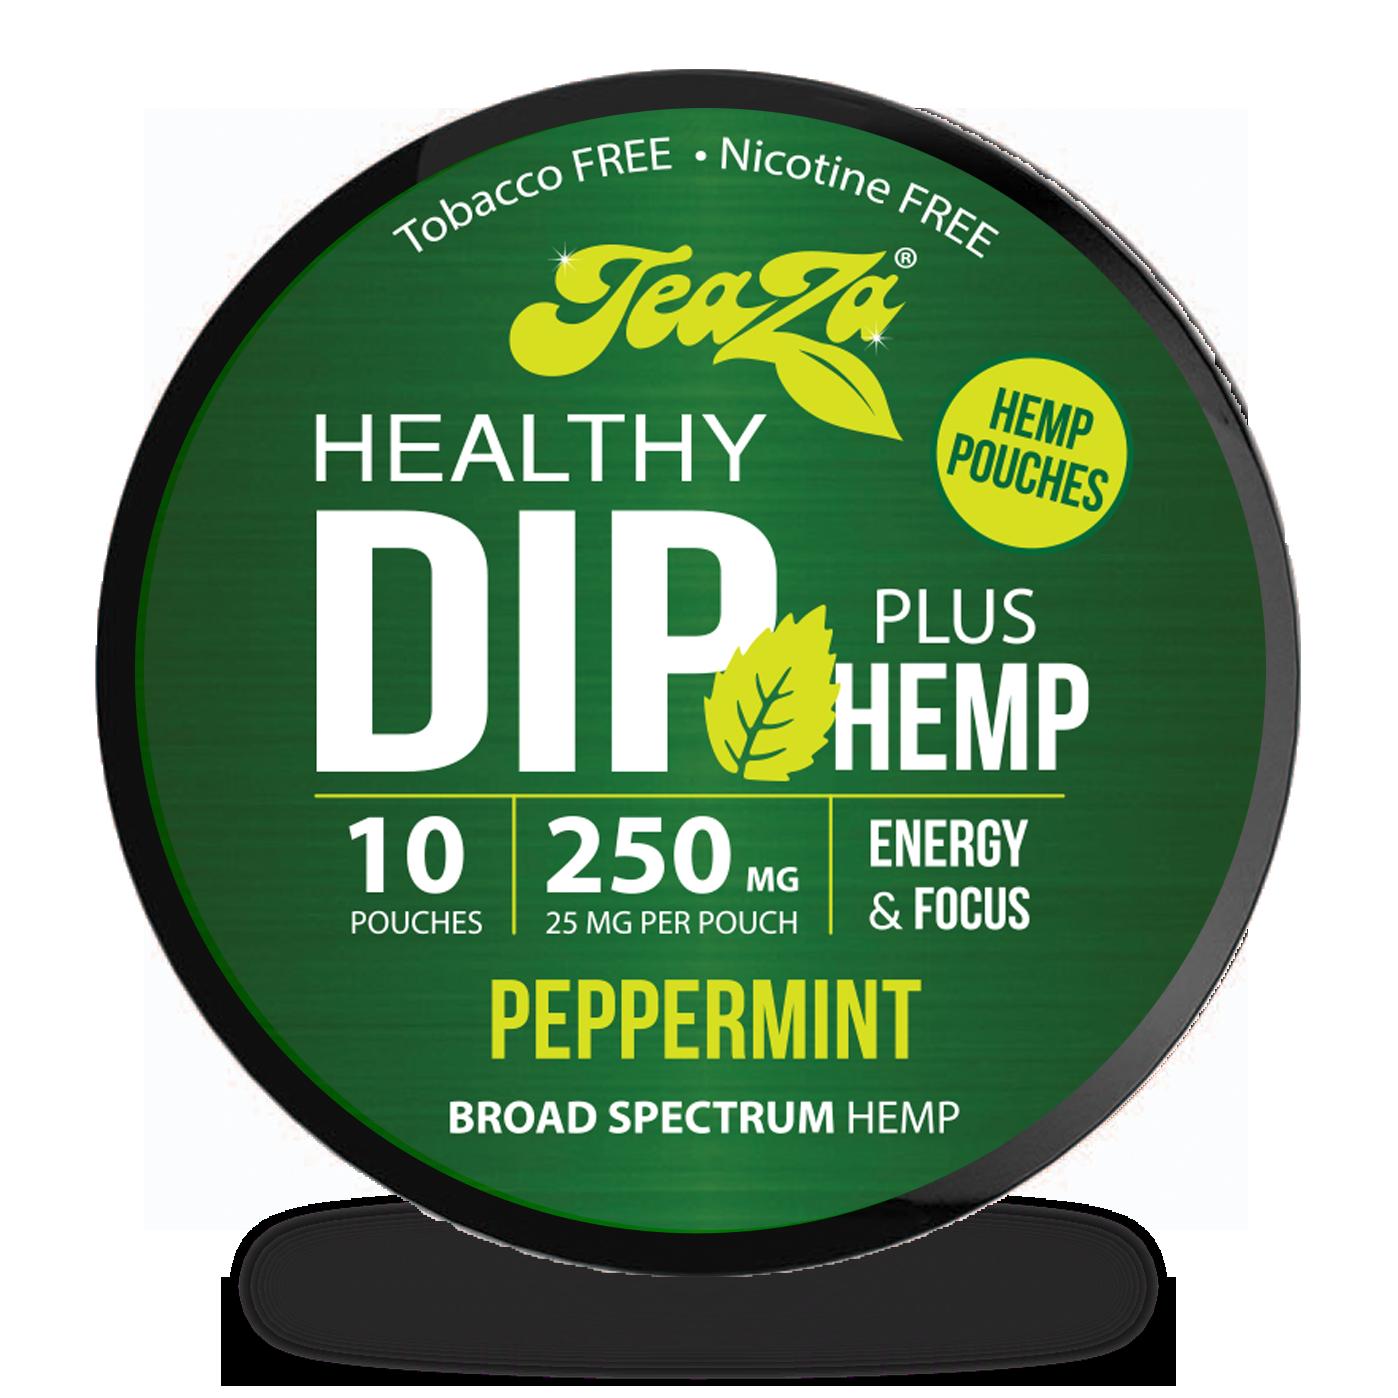 Peppermint TeaZa Hemp Dip Pouches